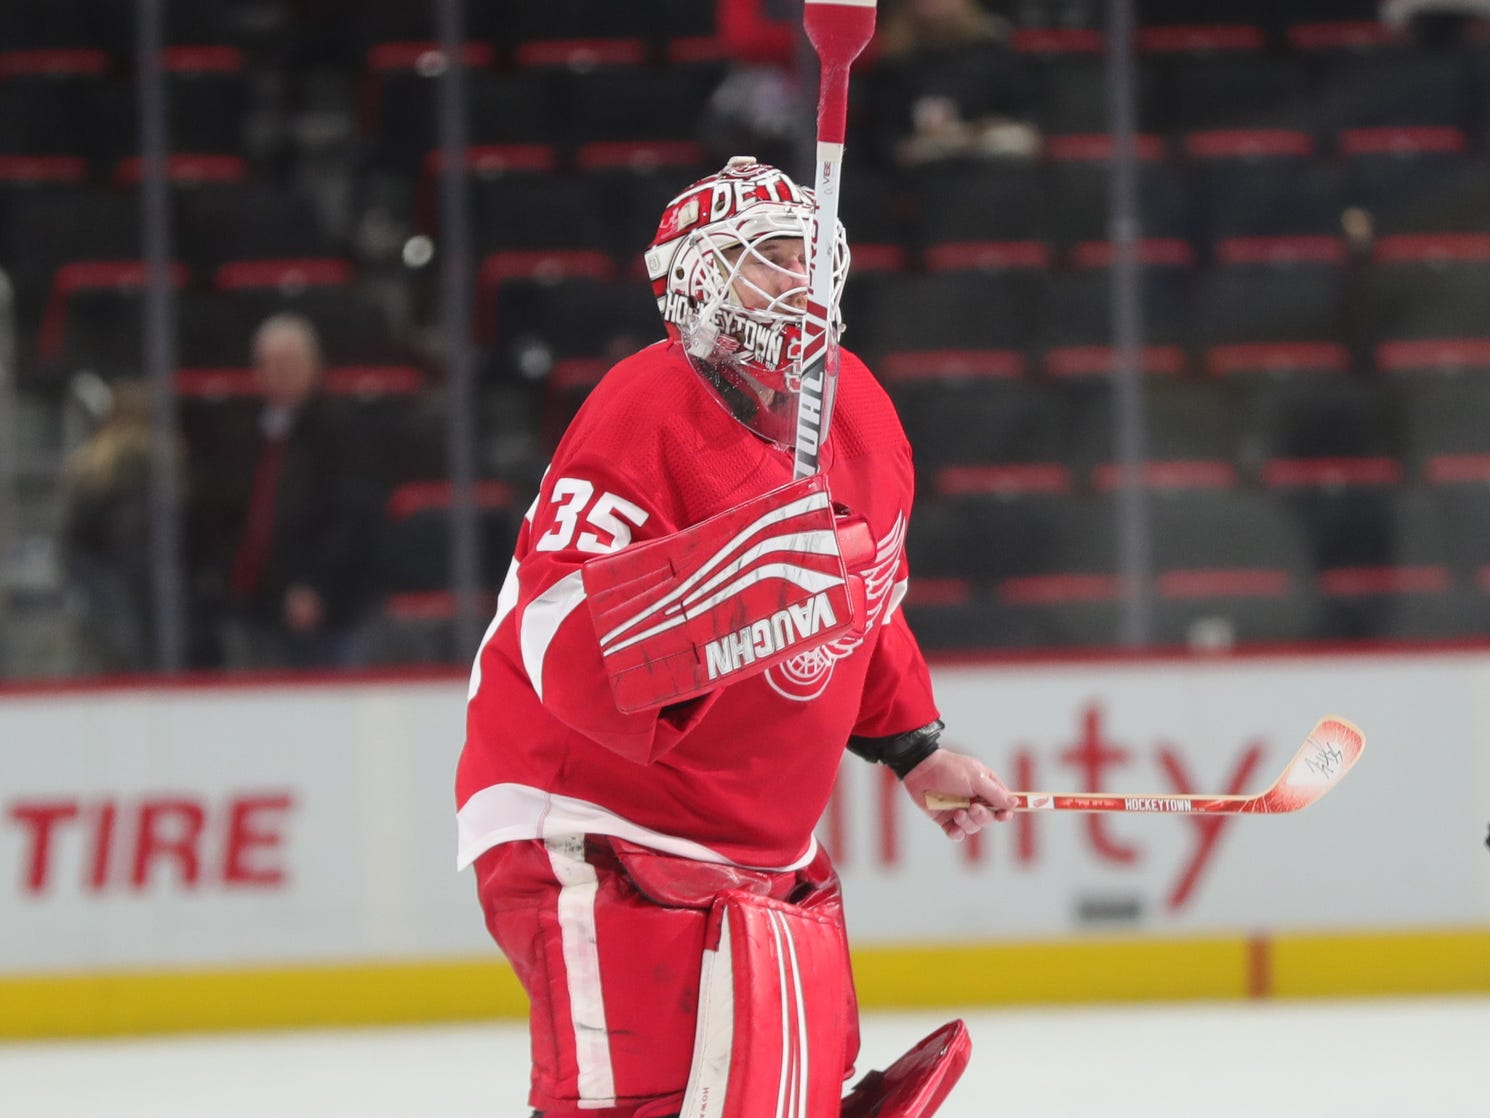 Detroit Red Wings goalie Jimmy Howard completed his 500th career game against the Ottawa Senators on Thursday, Feb. 14, 2019 at Little Caesars Arena in Detroit.